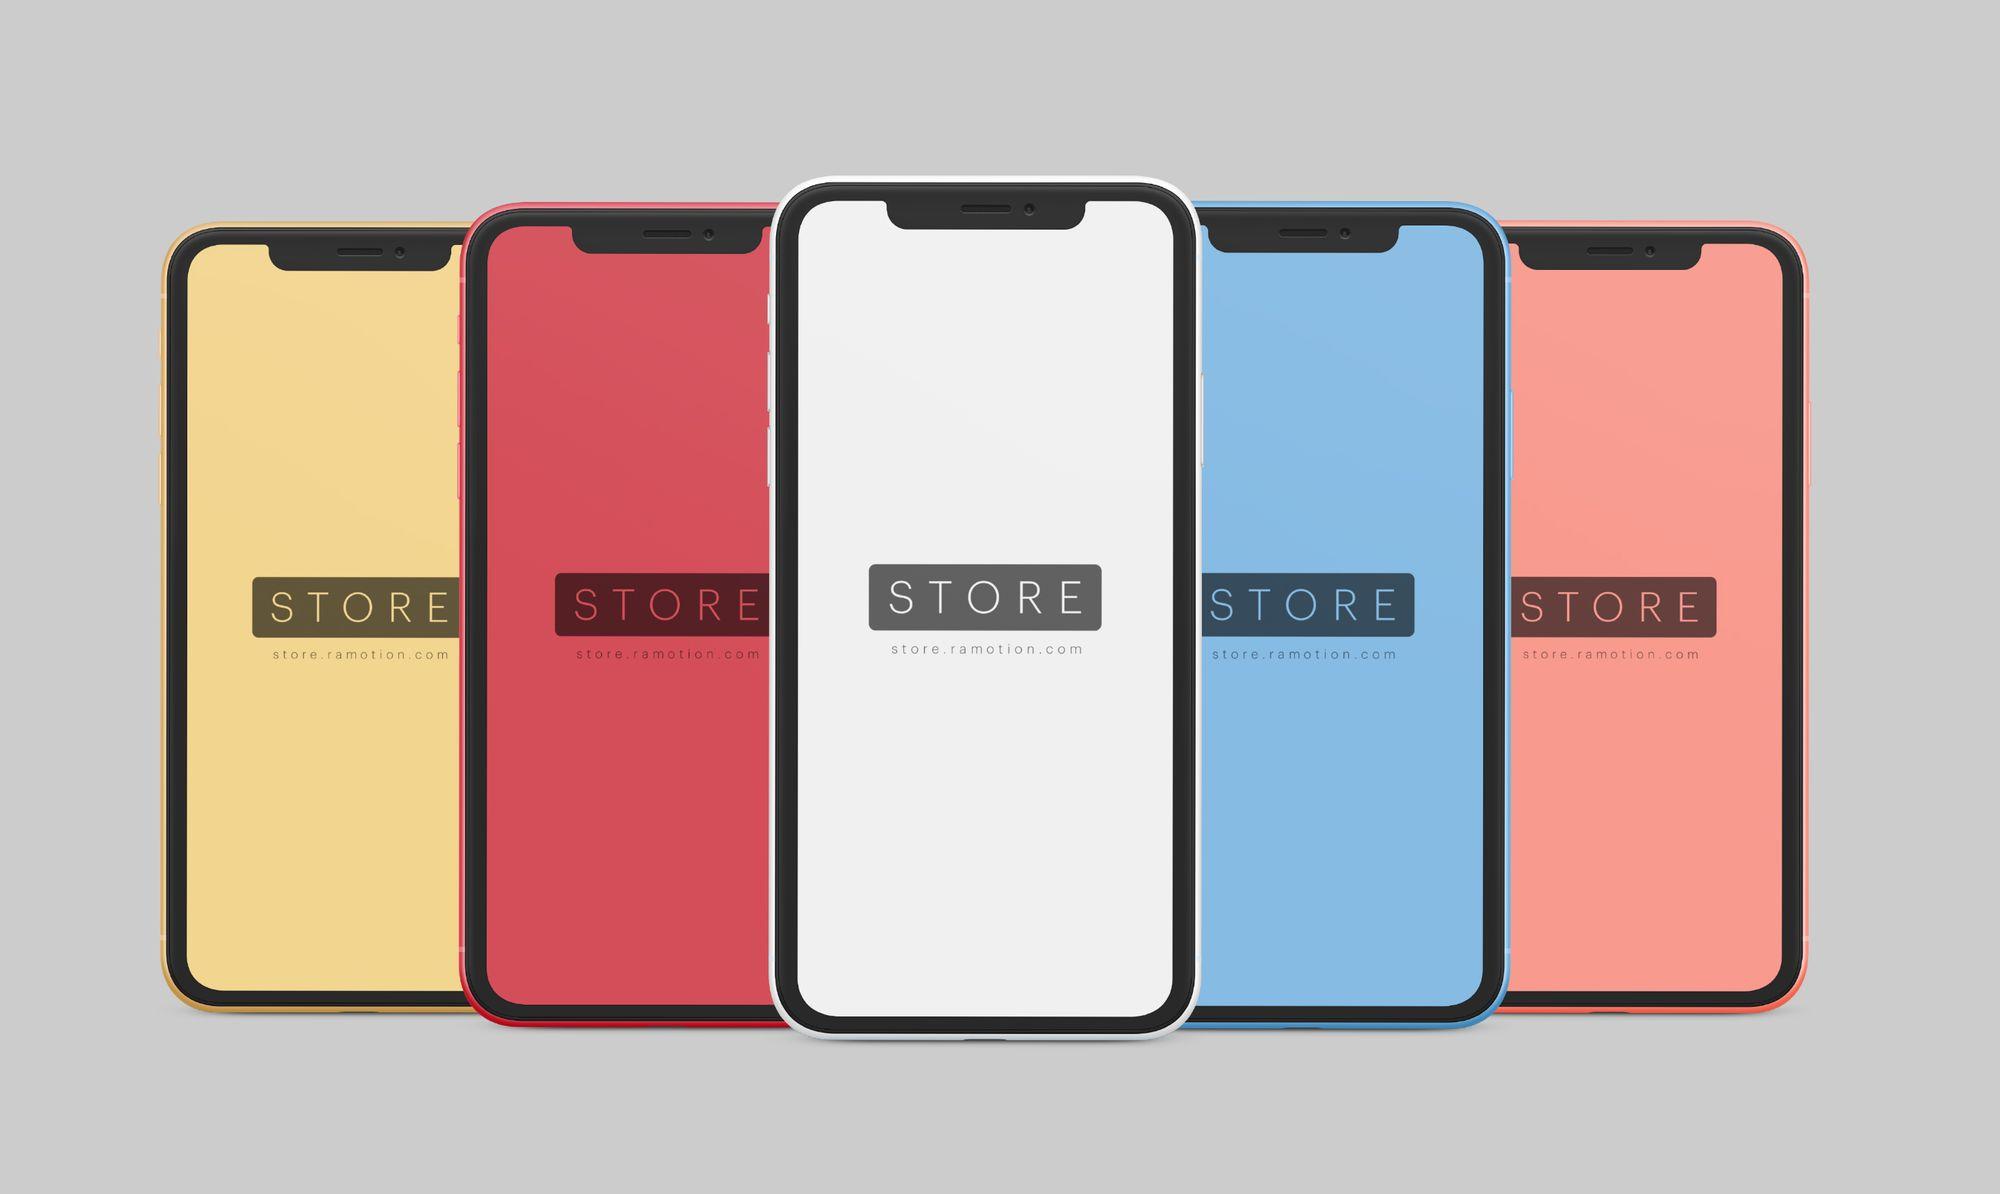 iPhone X Mockup [PSD, Sketch]